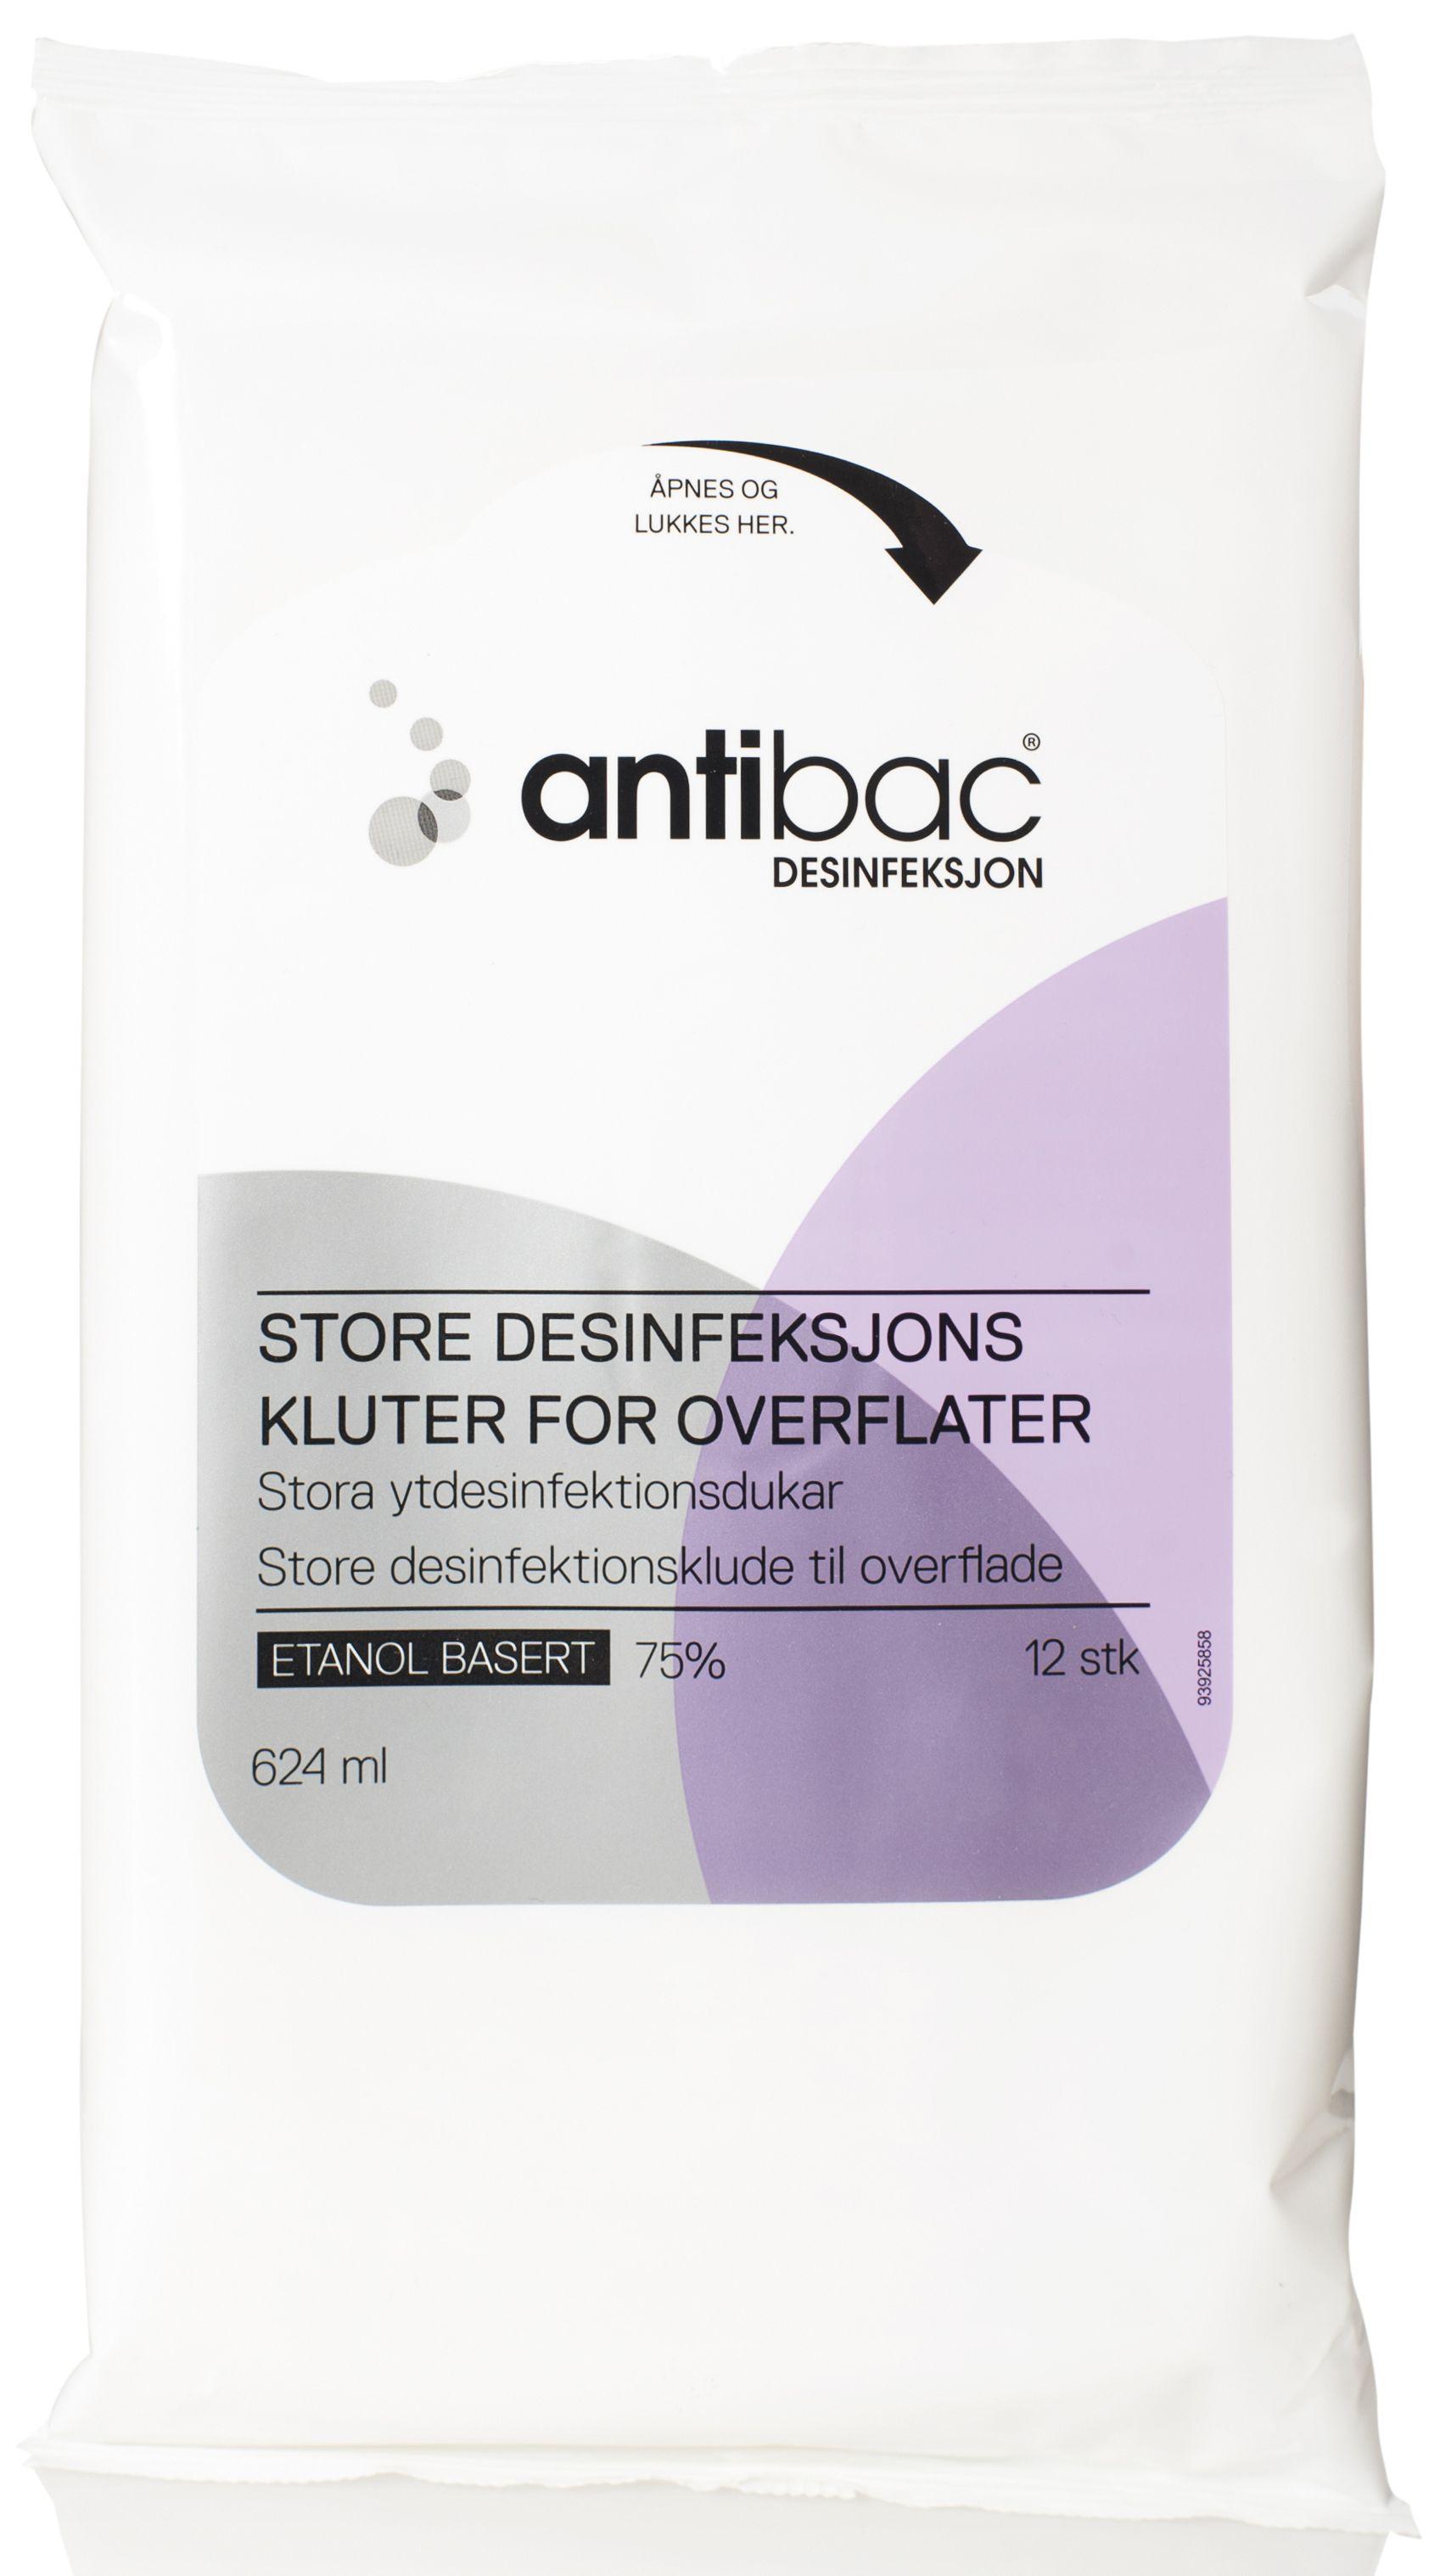 Antibac Desinfeksjonskluter 24x40cm (12) Y486927